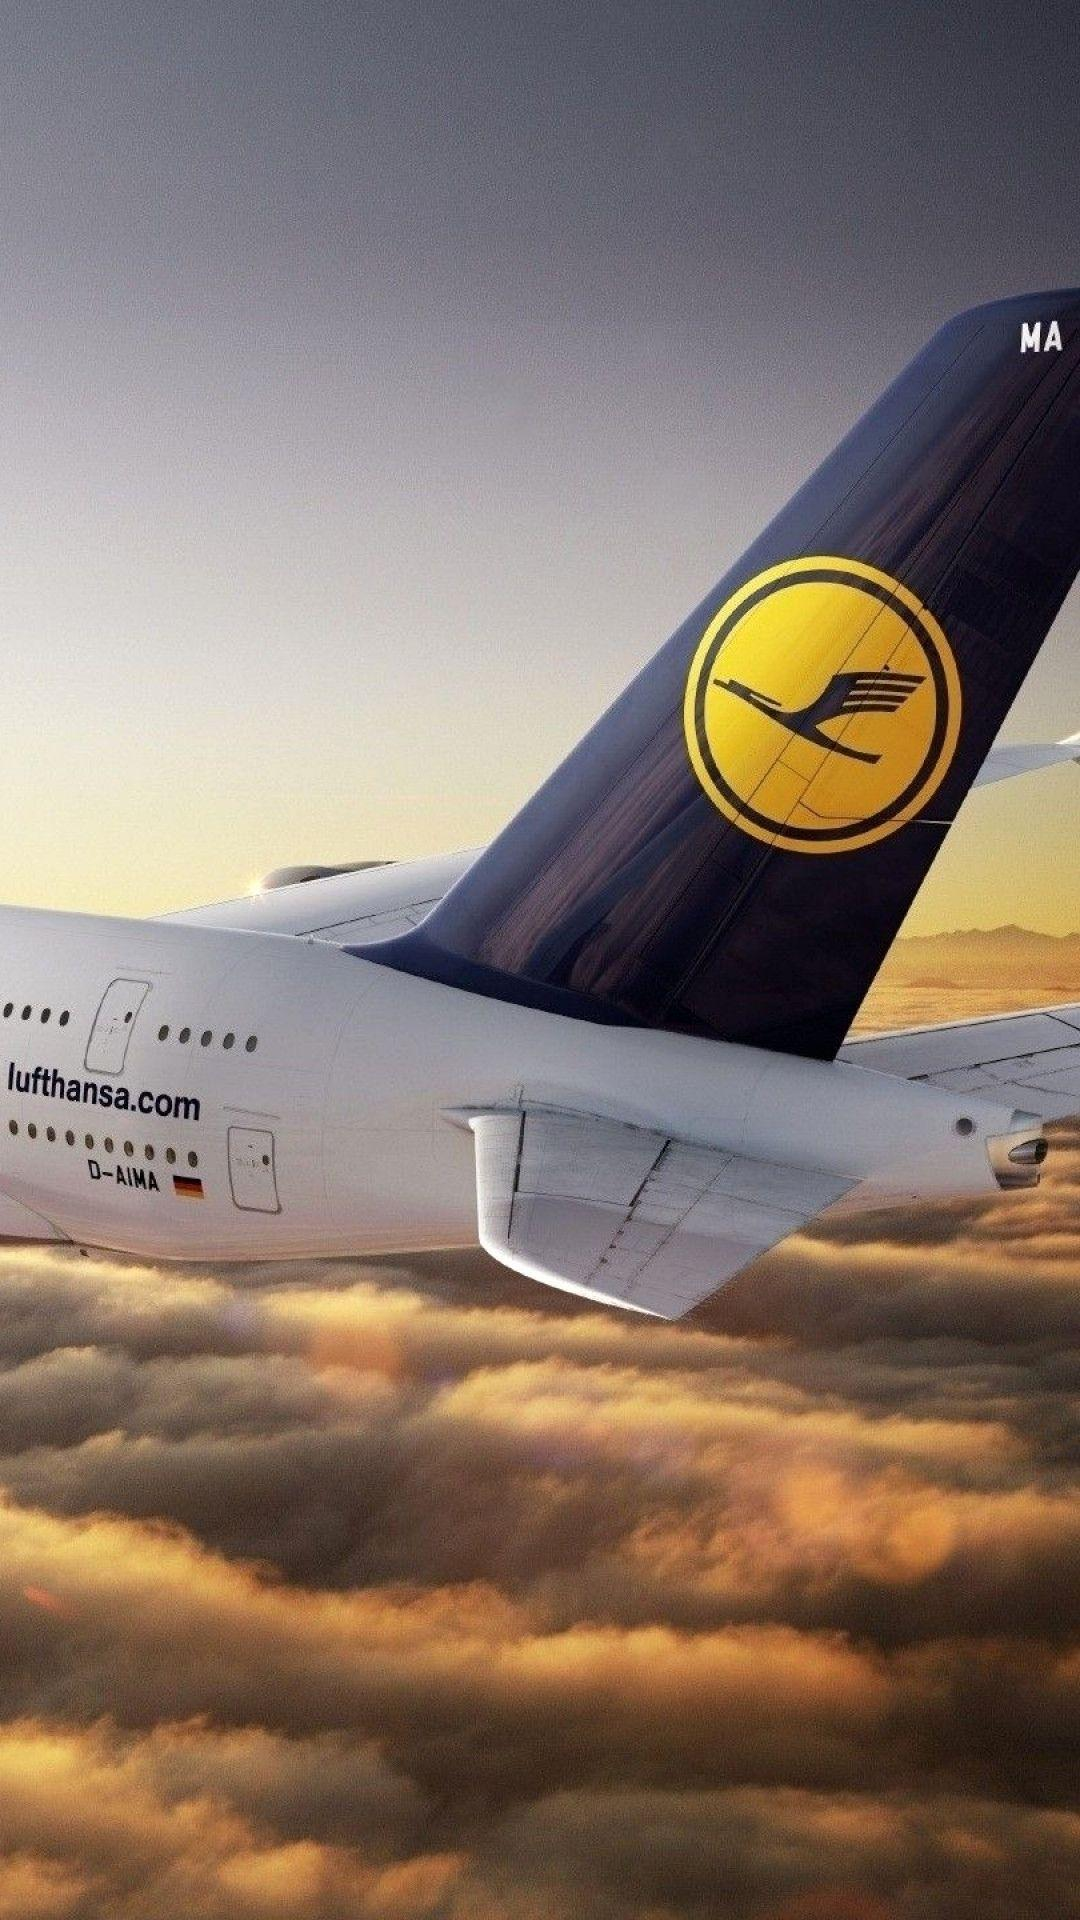 Lufthansa Wallpapers HD - Wallpaper Cave